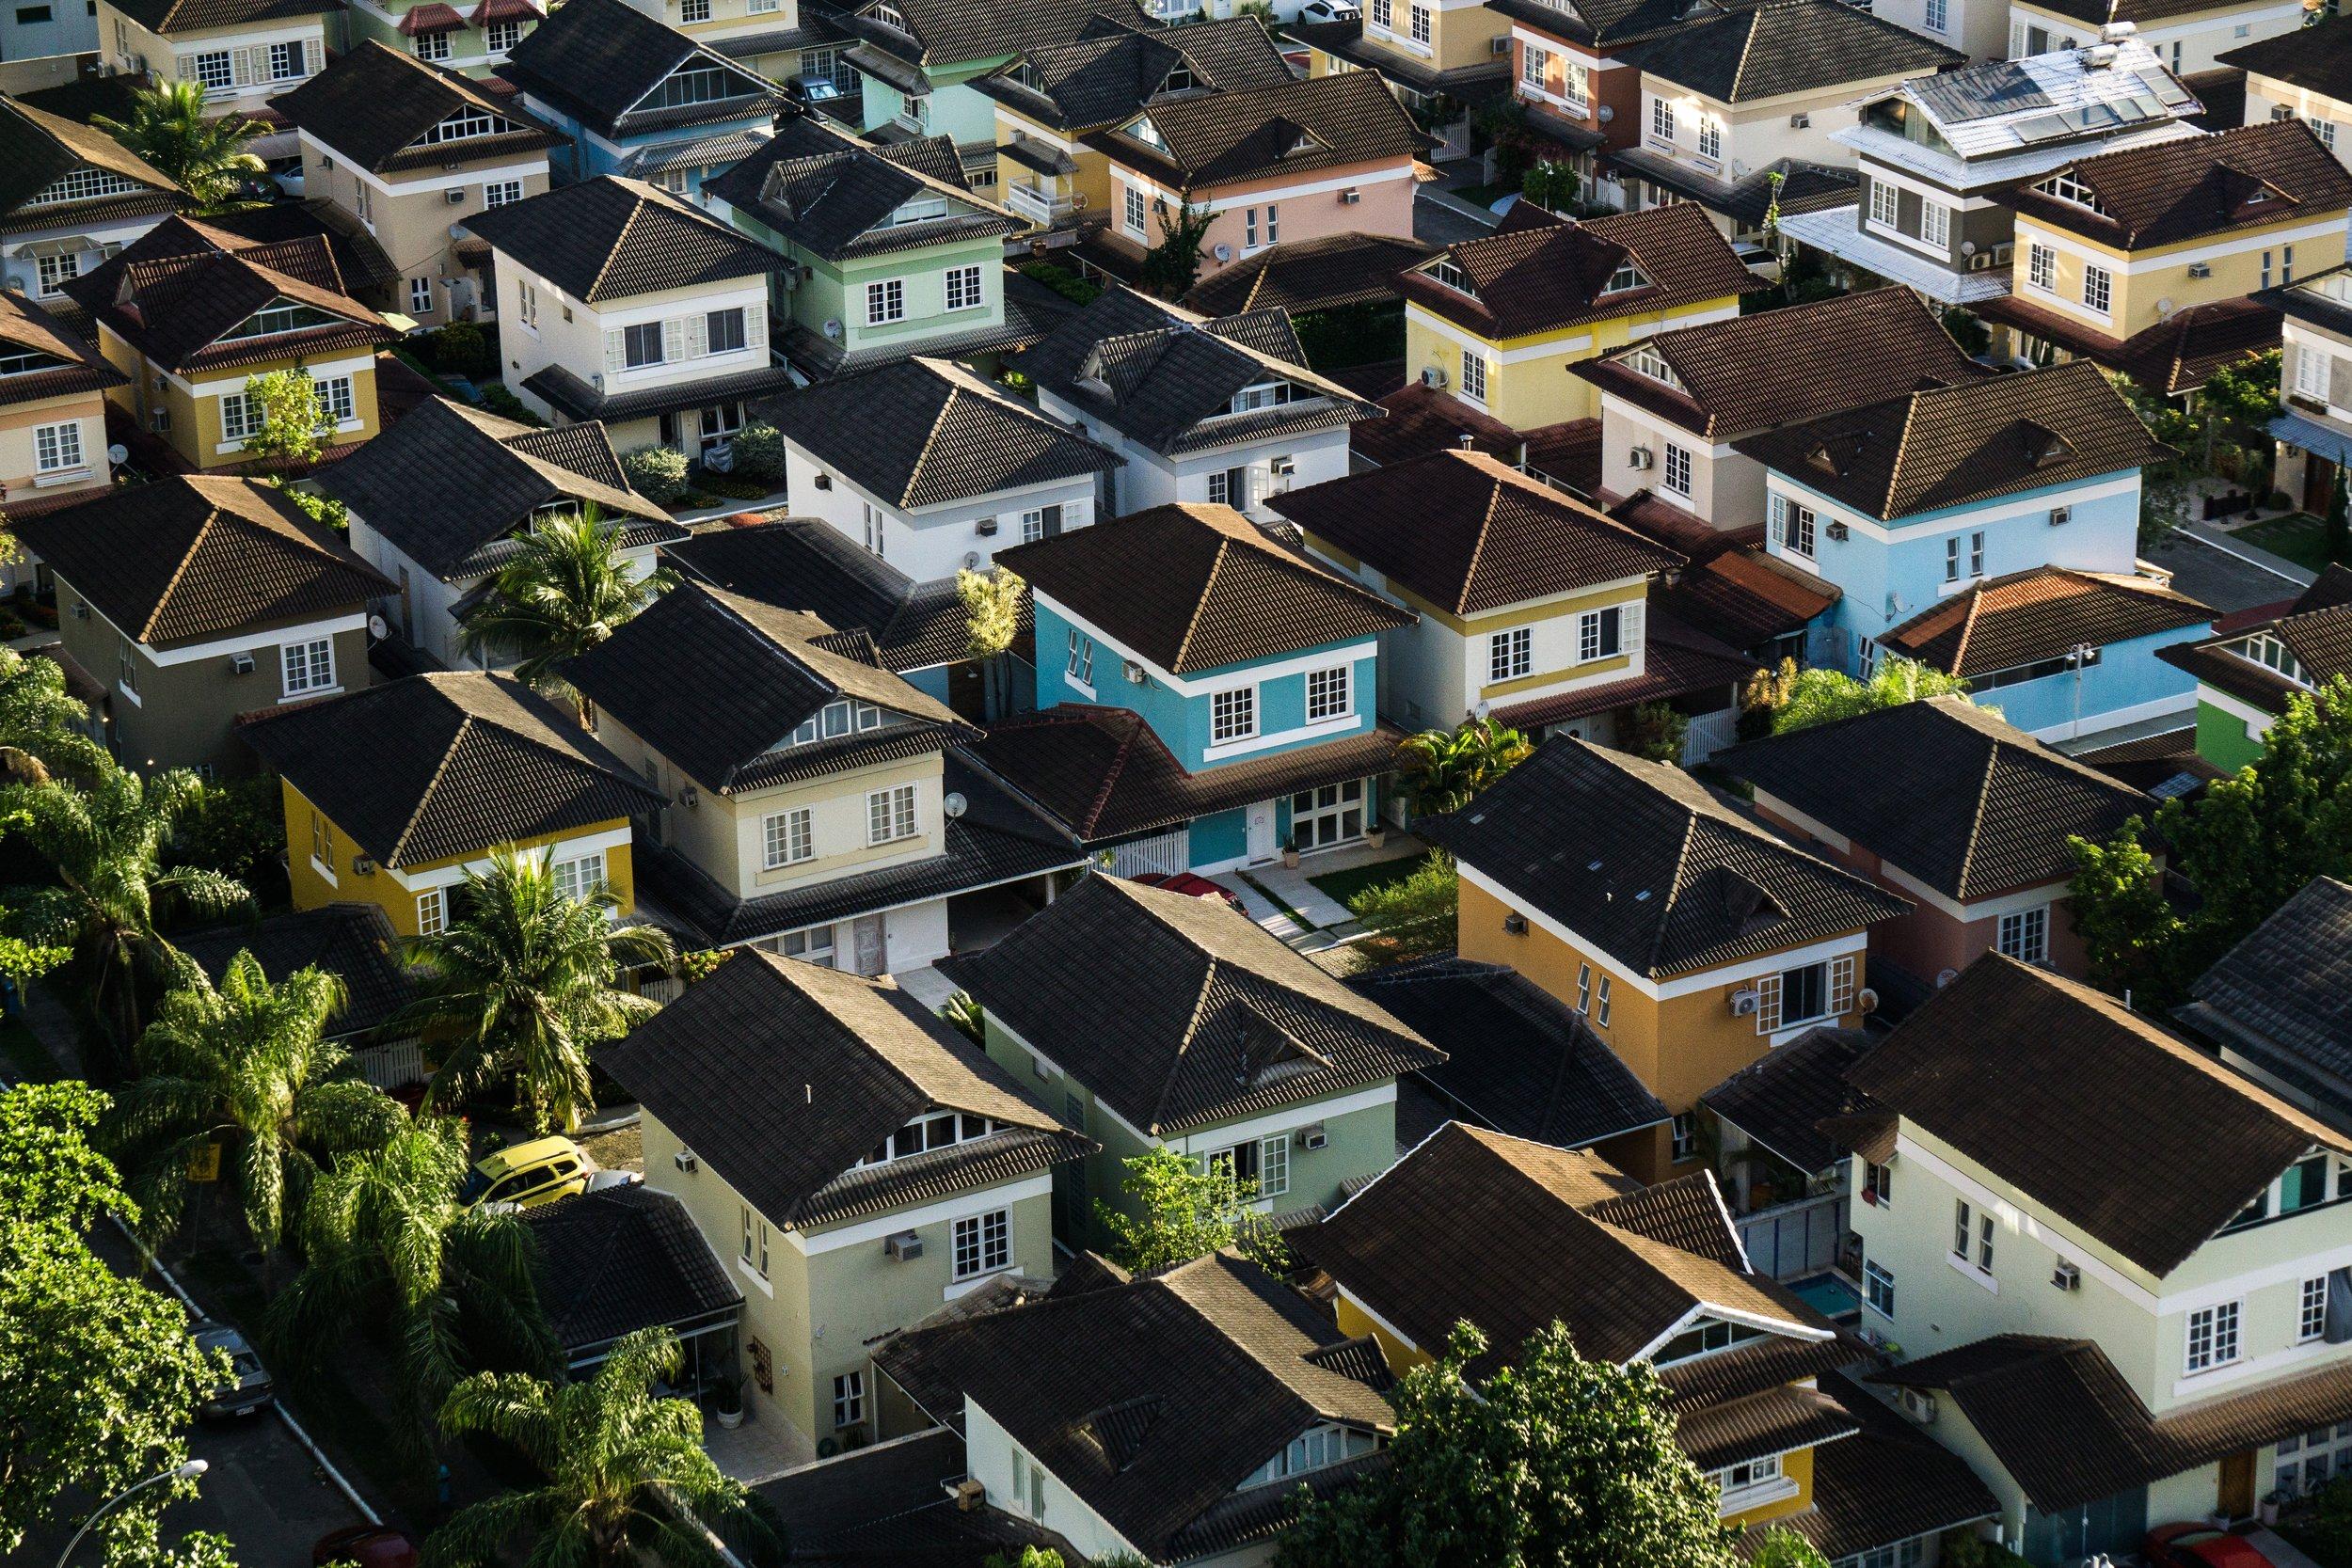 Birdseye view of houses